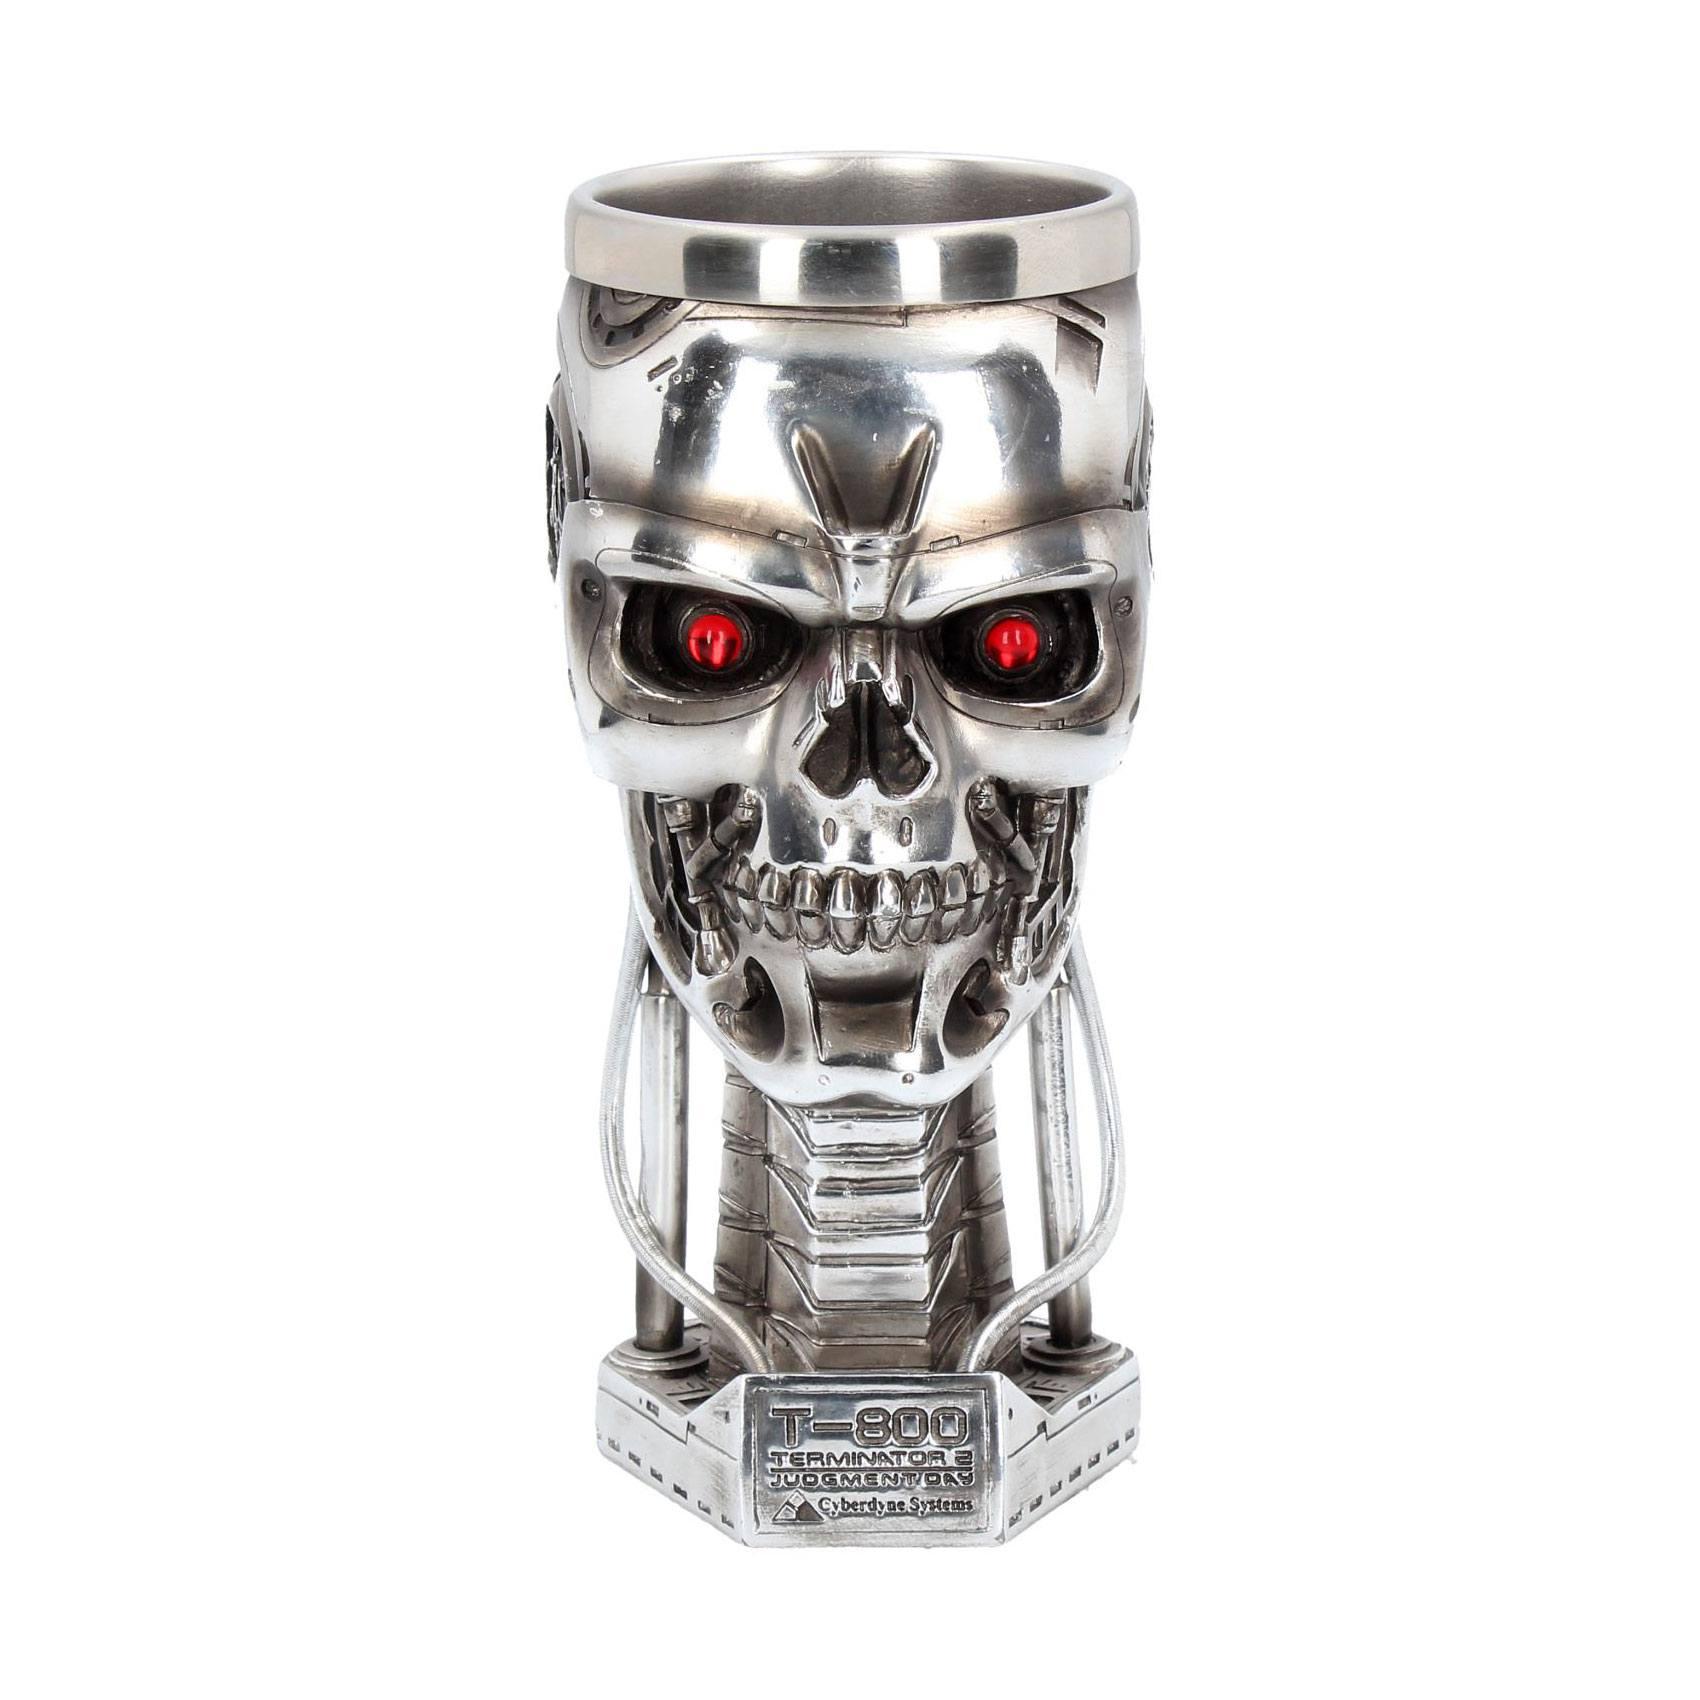 Terminator 2 Goblet Head